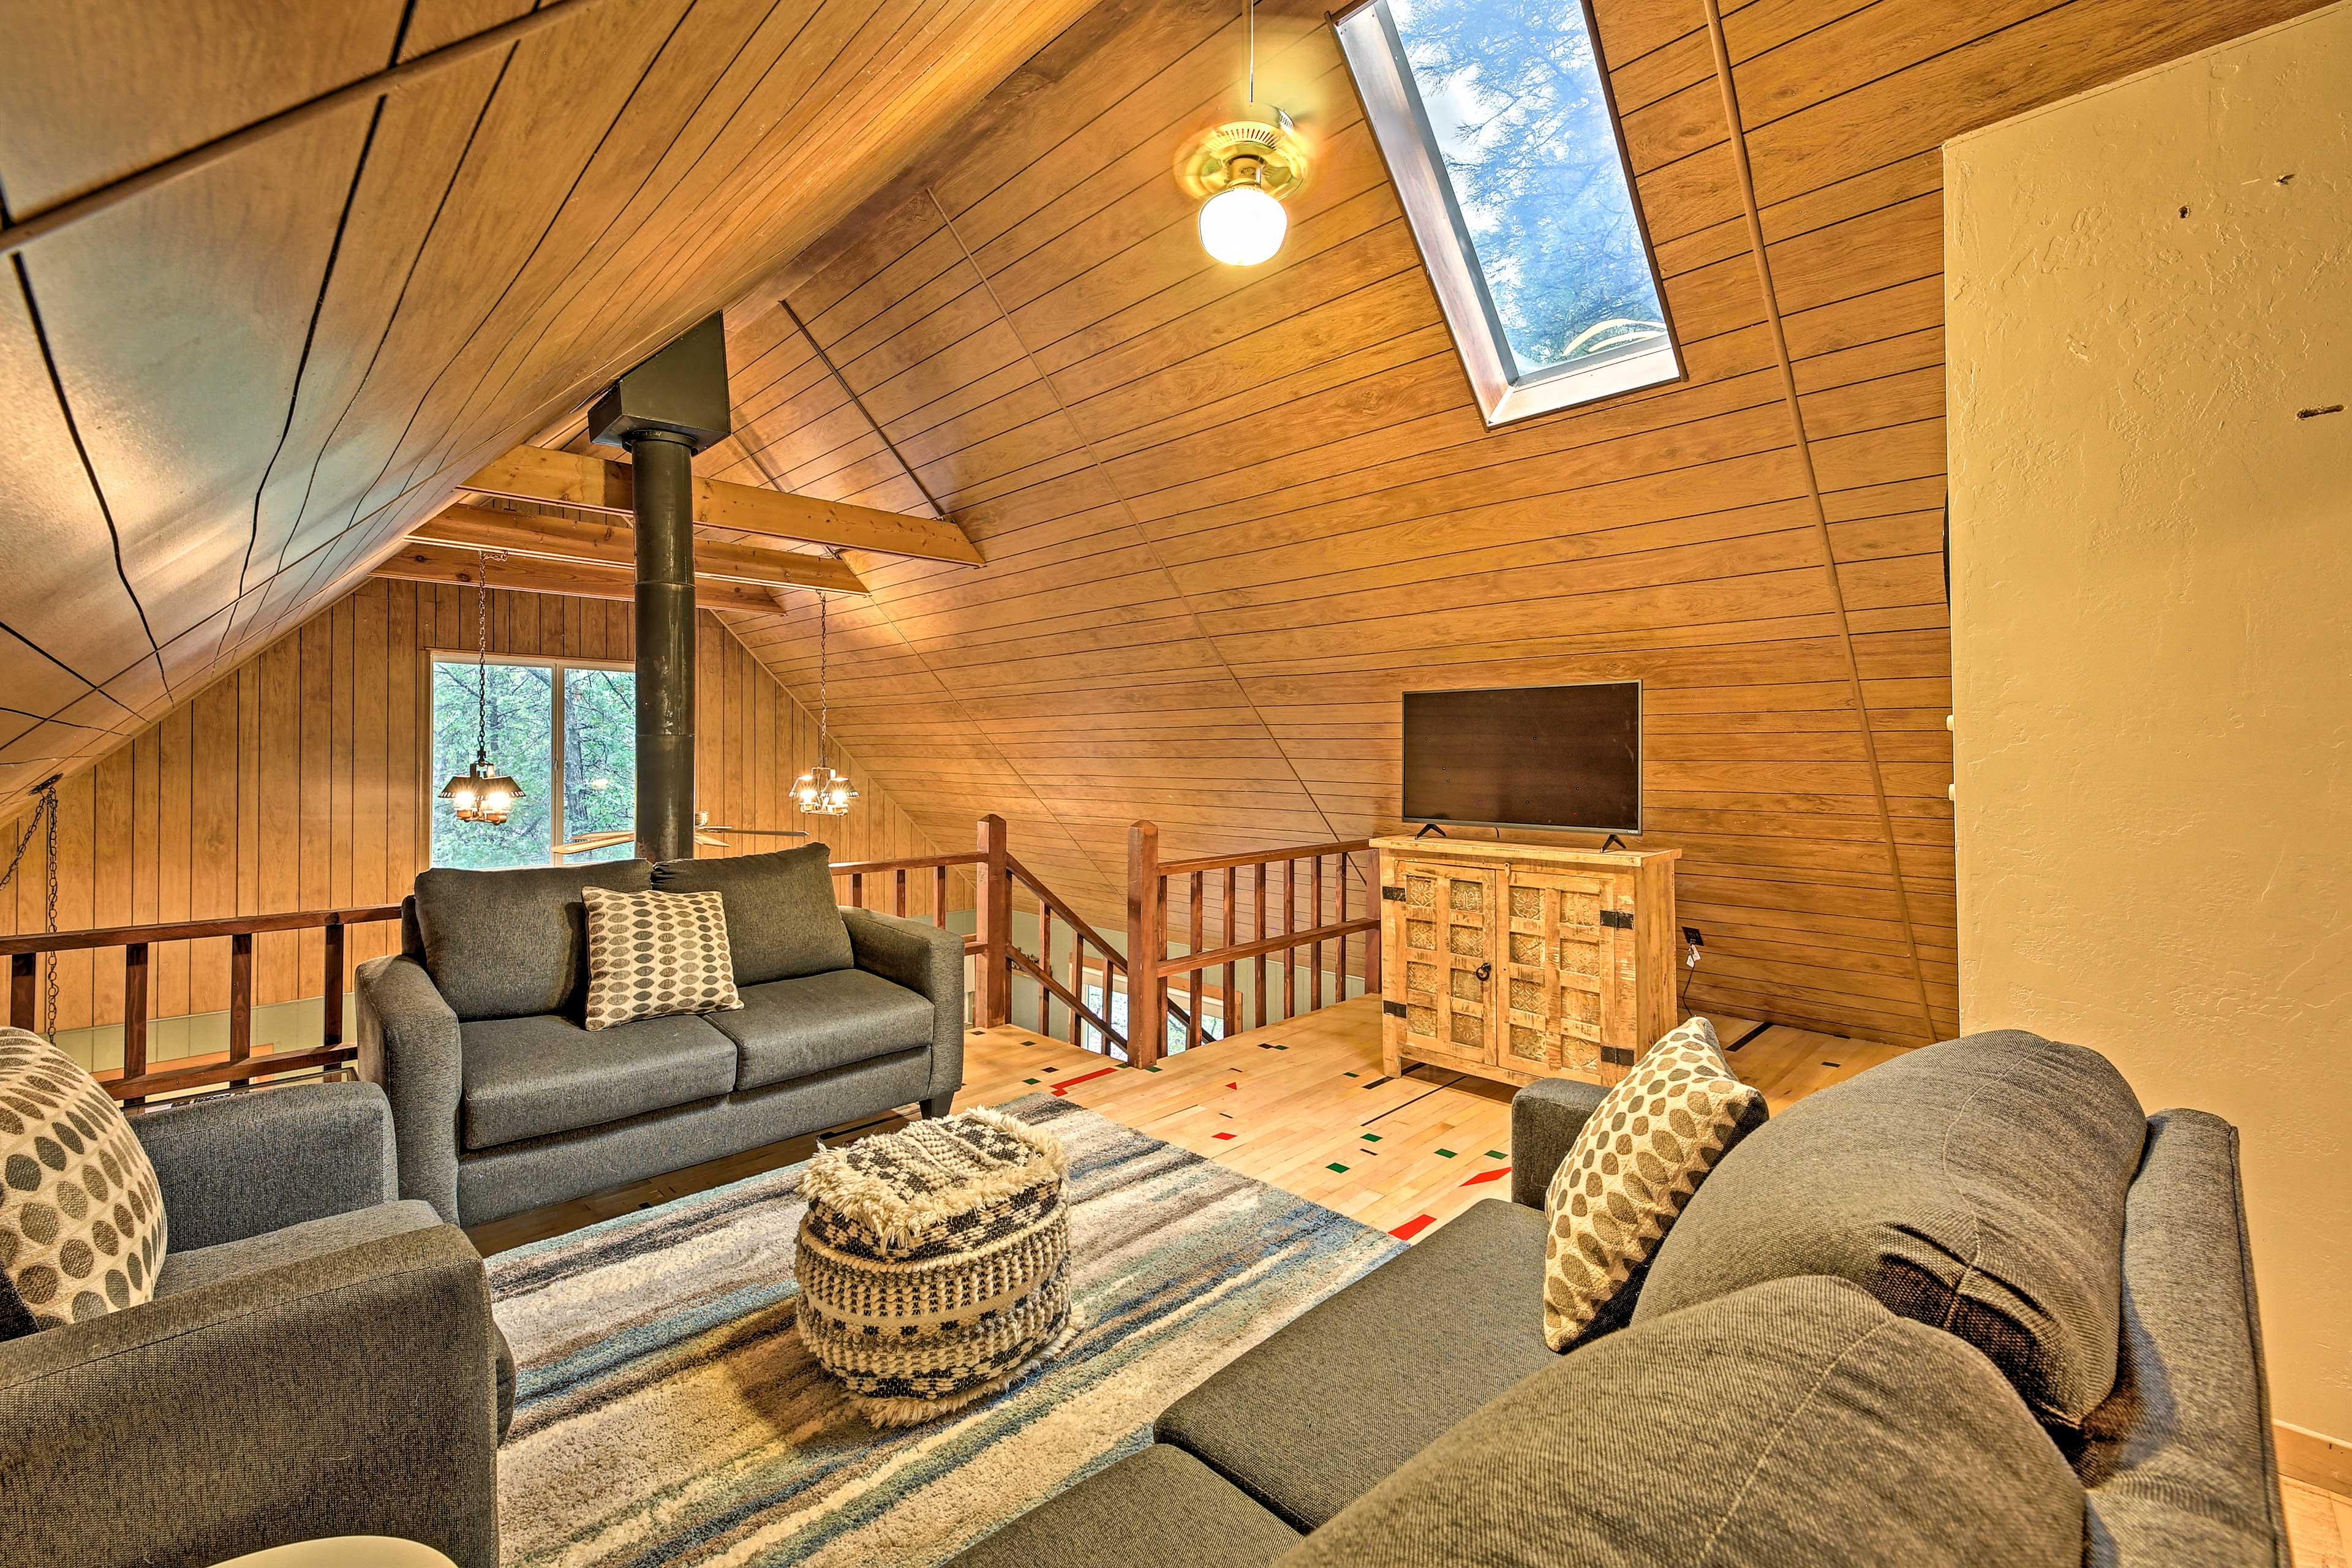 Loft | Second Living Room | 2 Smart TVs